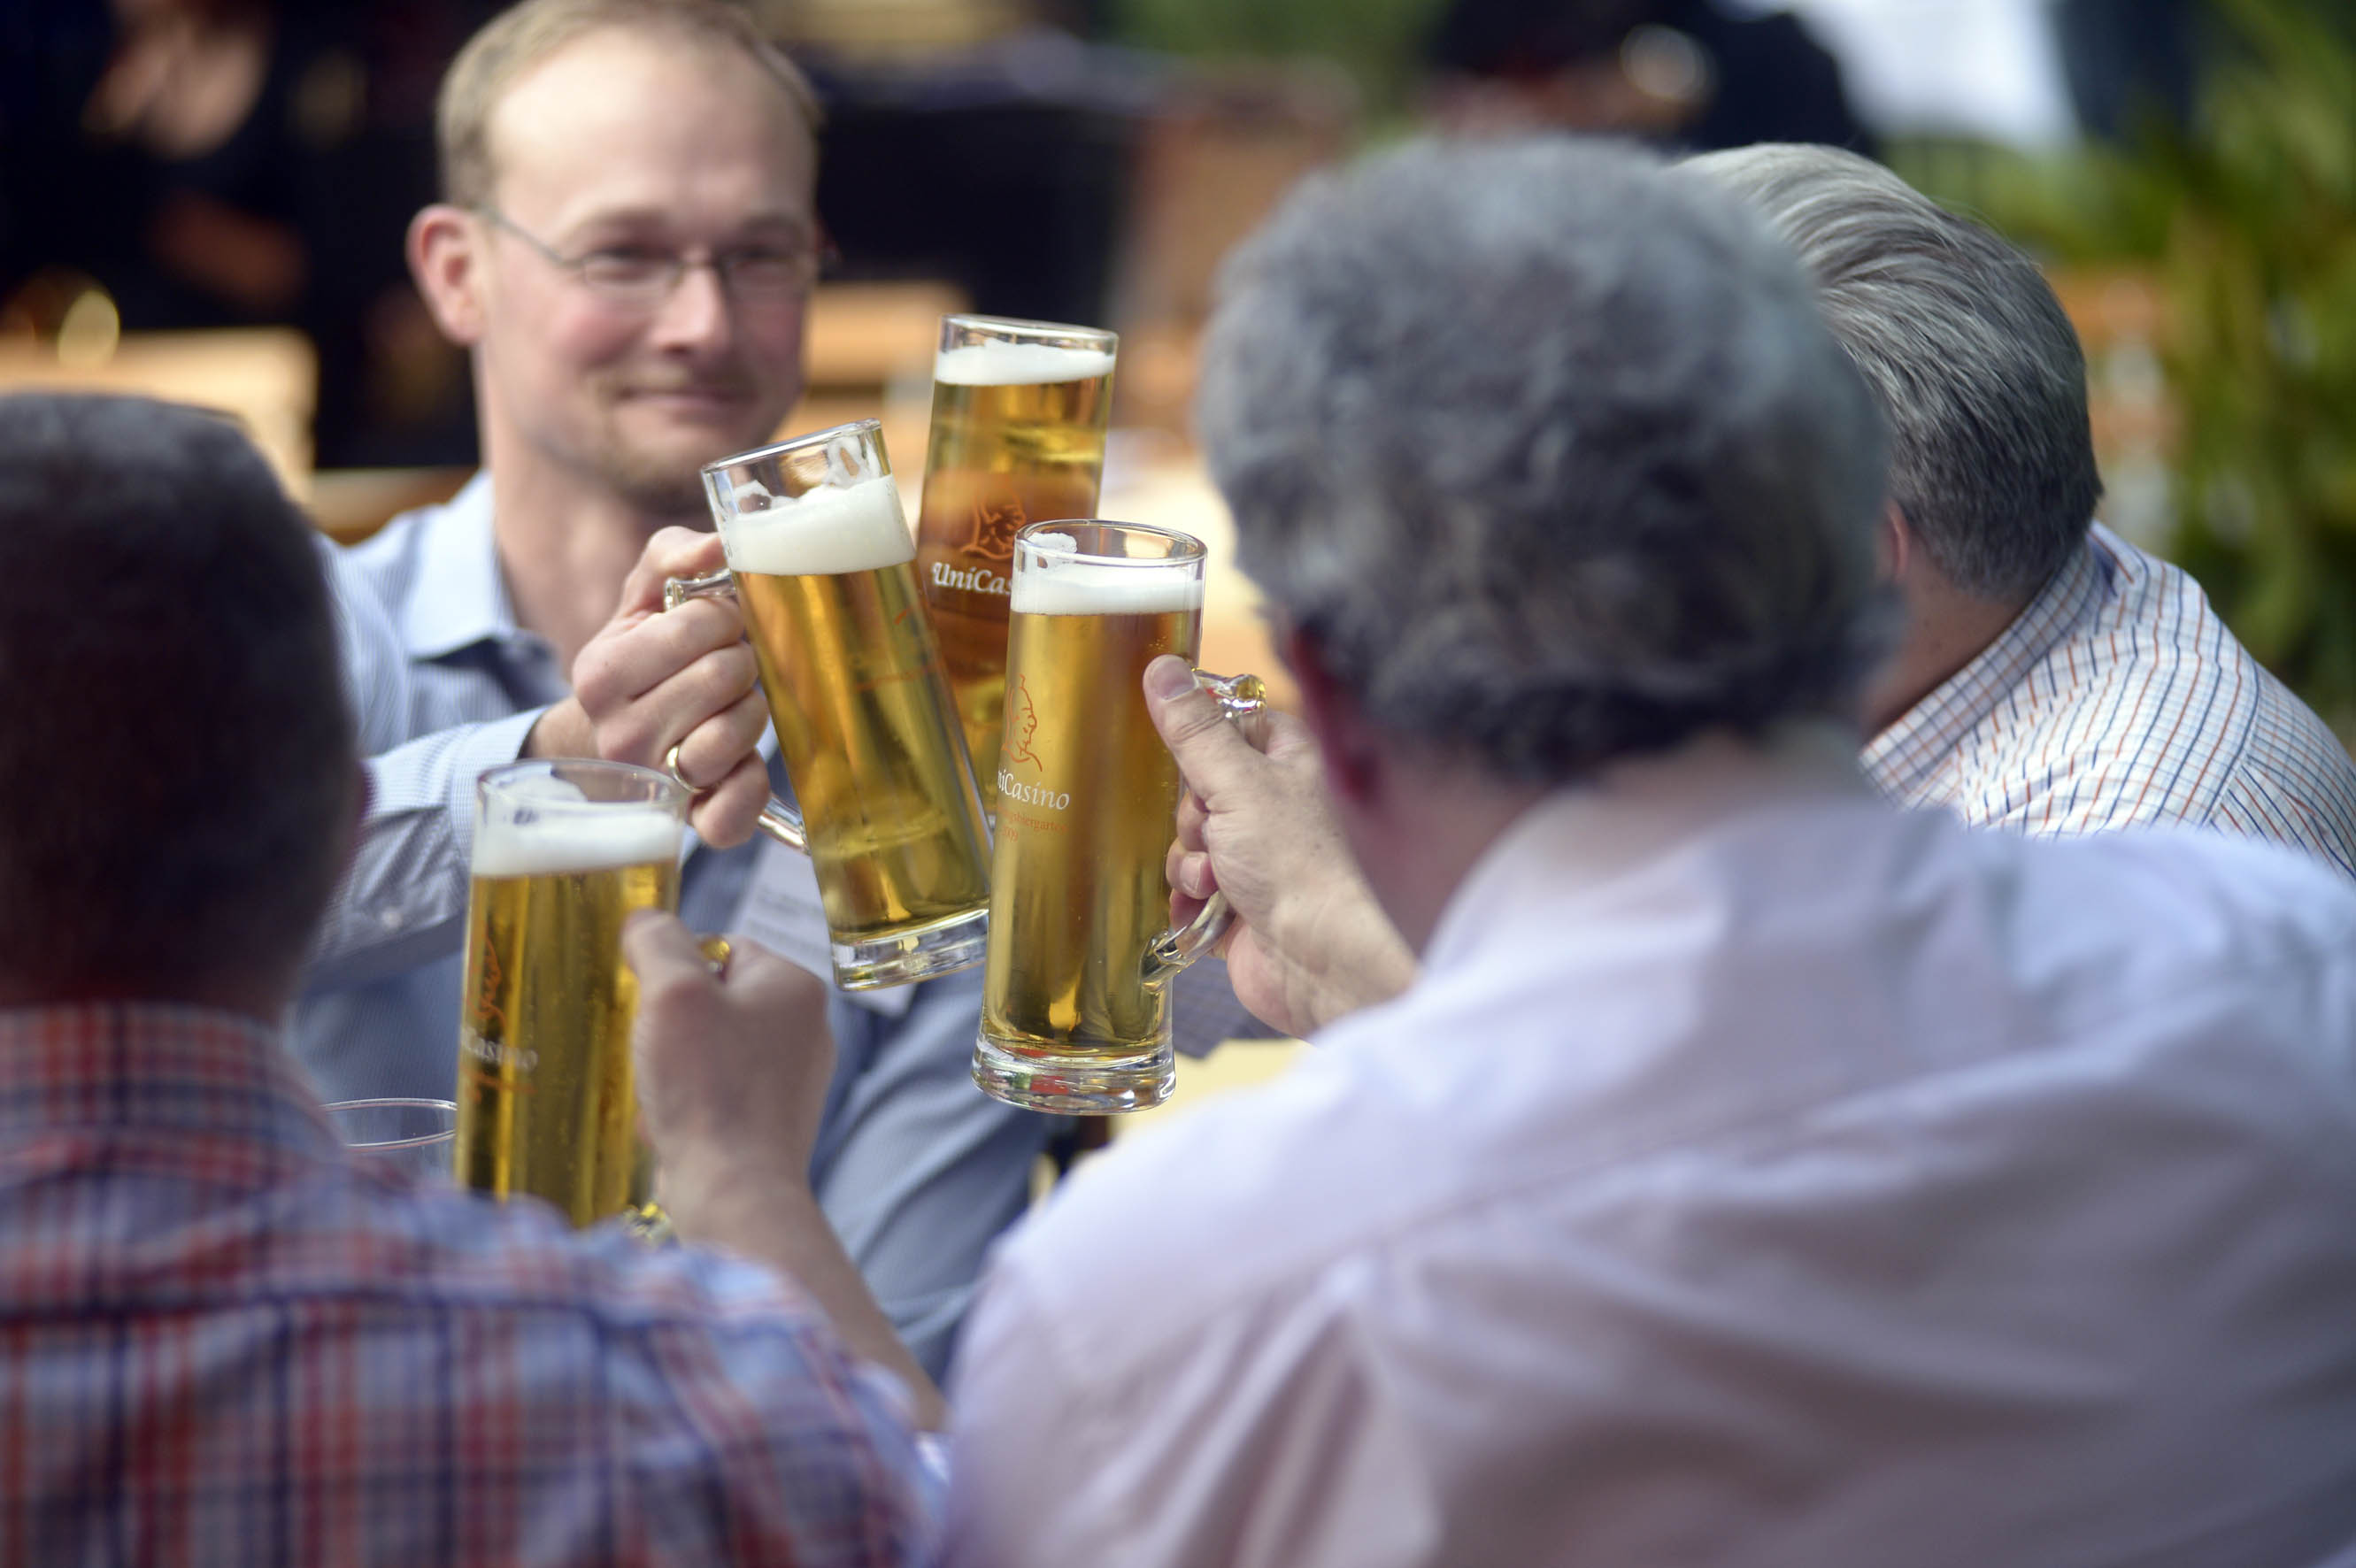 Männer mit großen Biergläsern